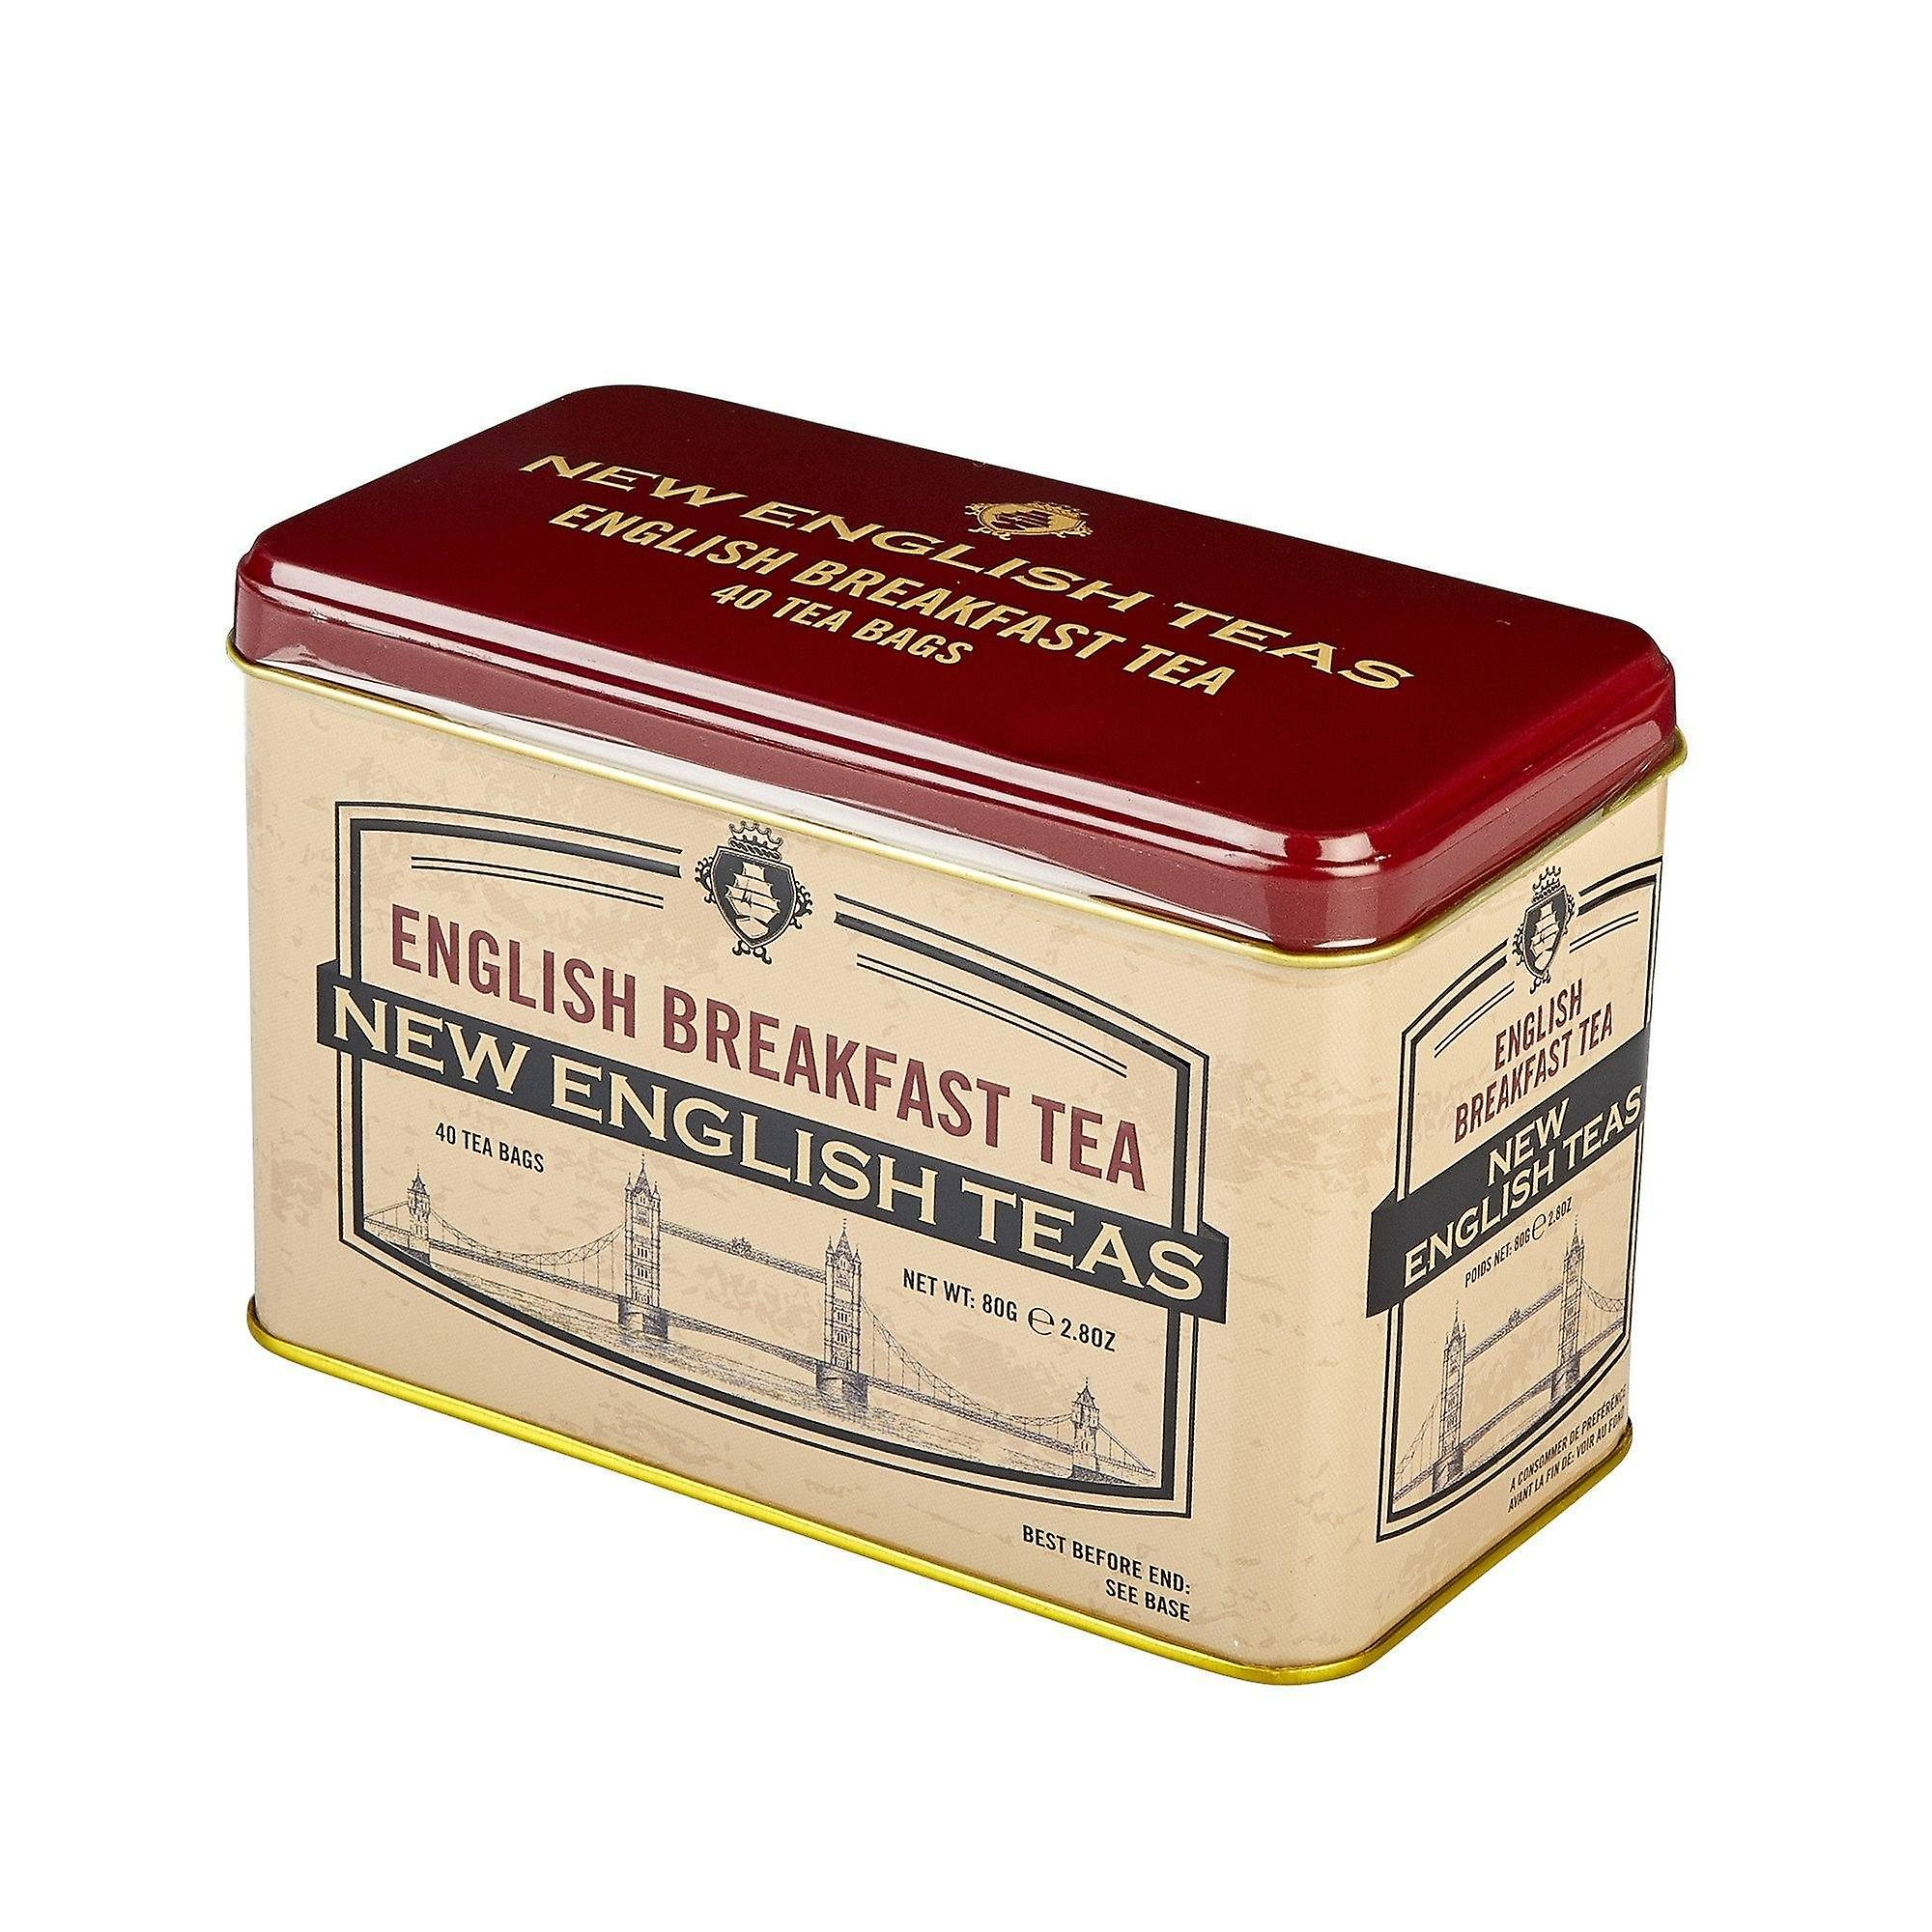 Vintage selection tower bridge english breakfast tea tin 40 teabags